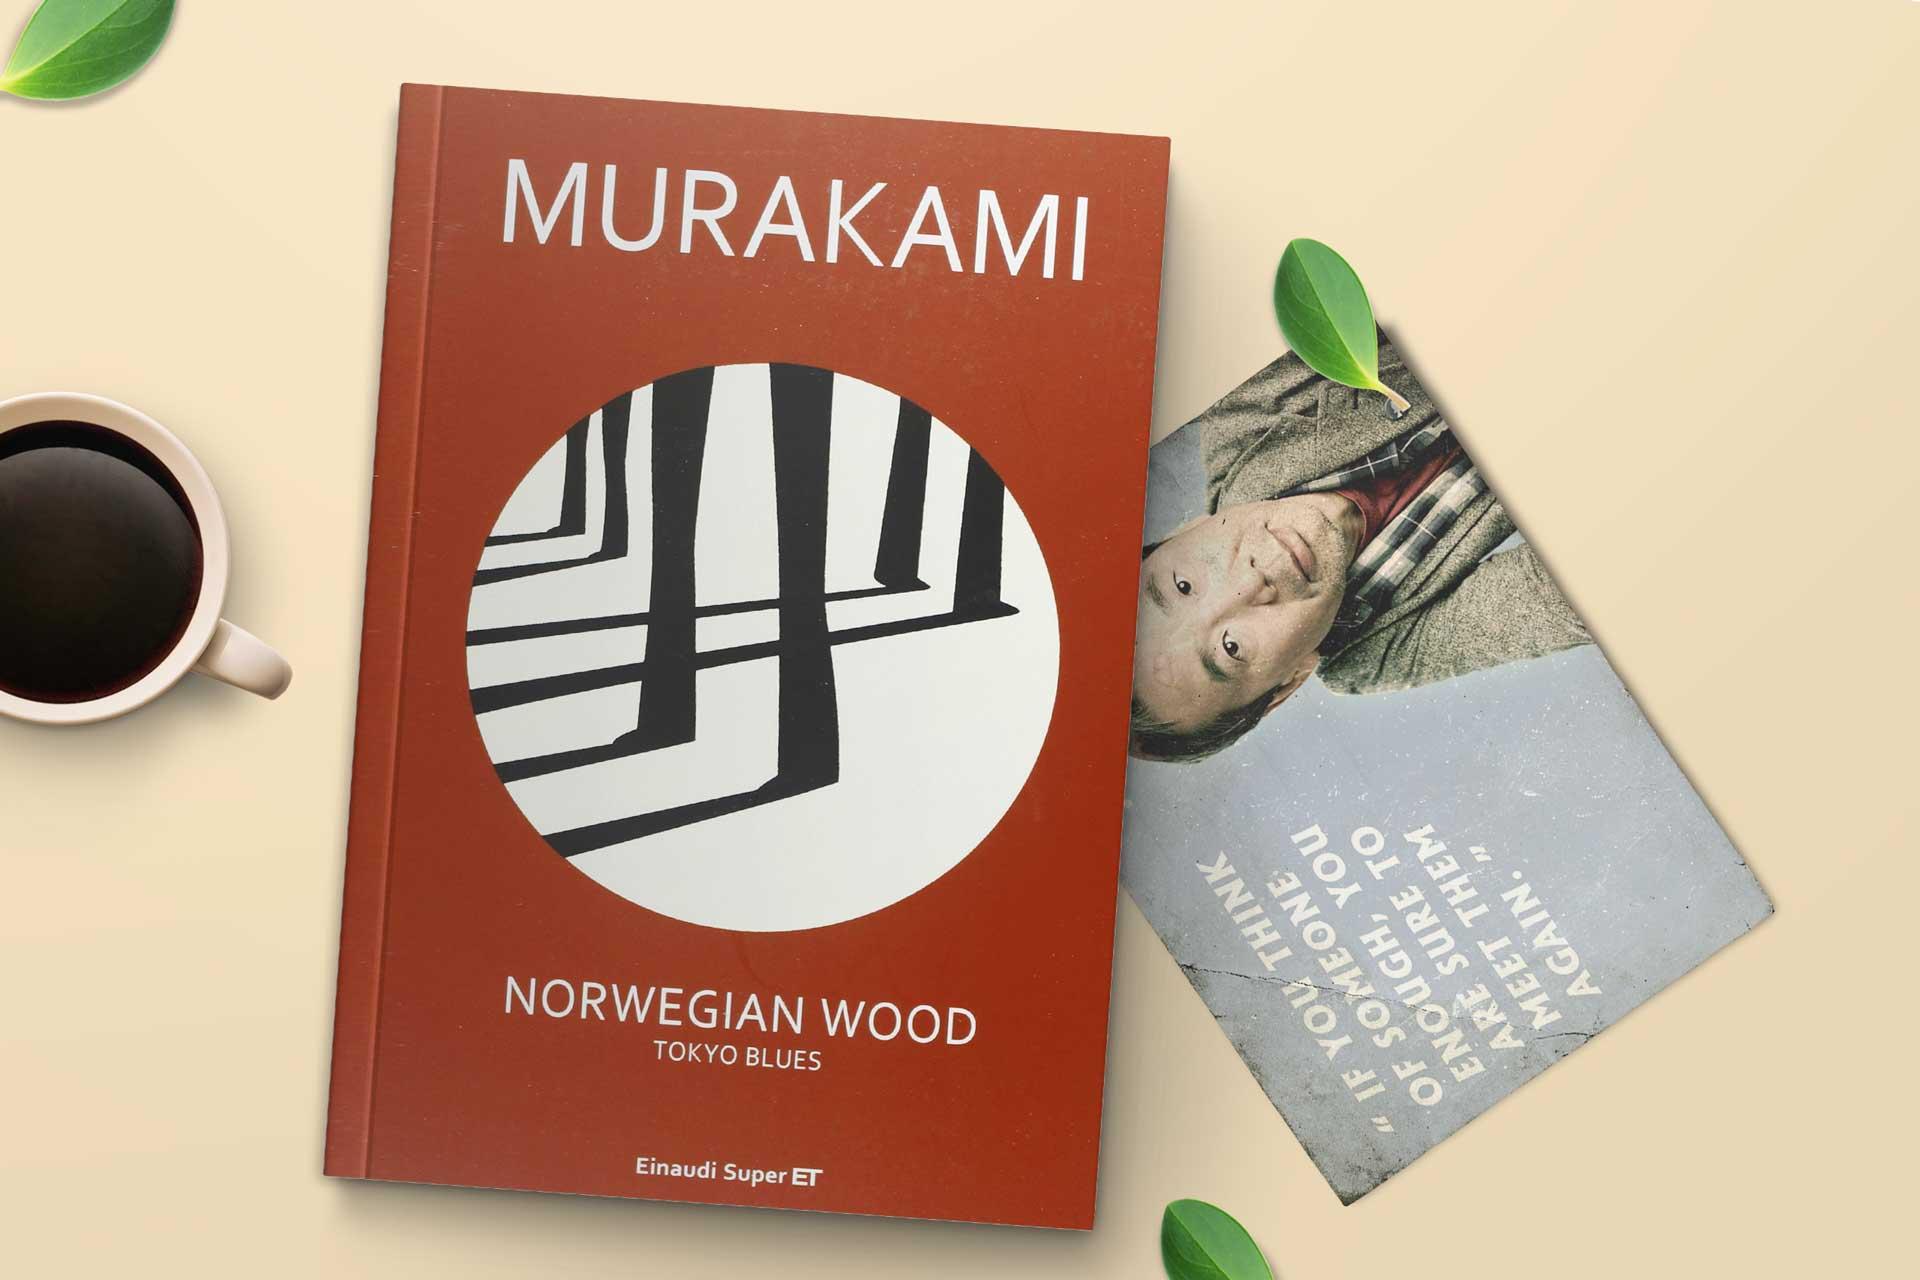 Migliori-libri-per-adolescenti-murakami-norwegian-wood